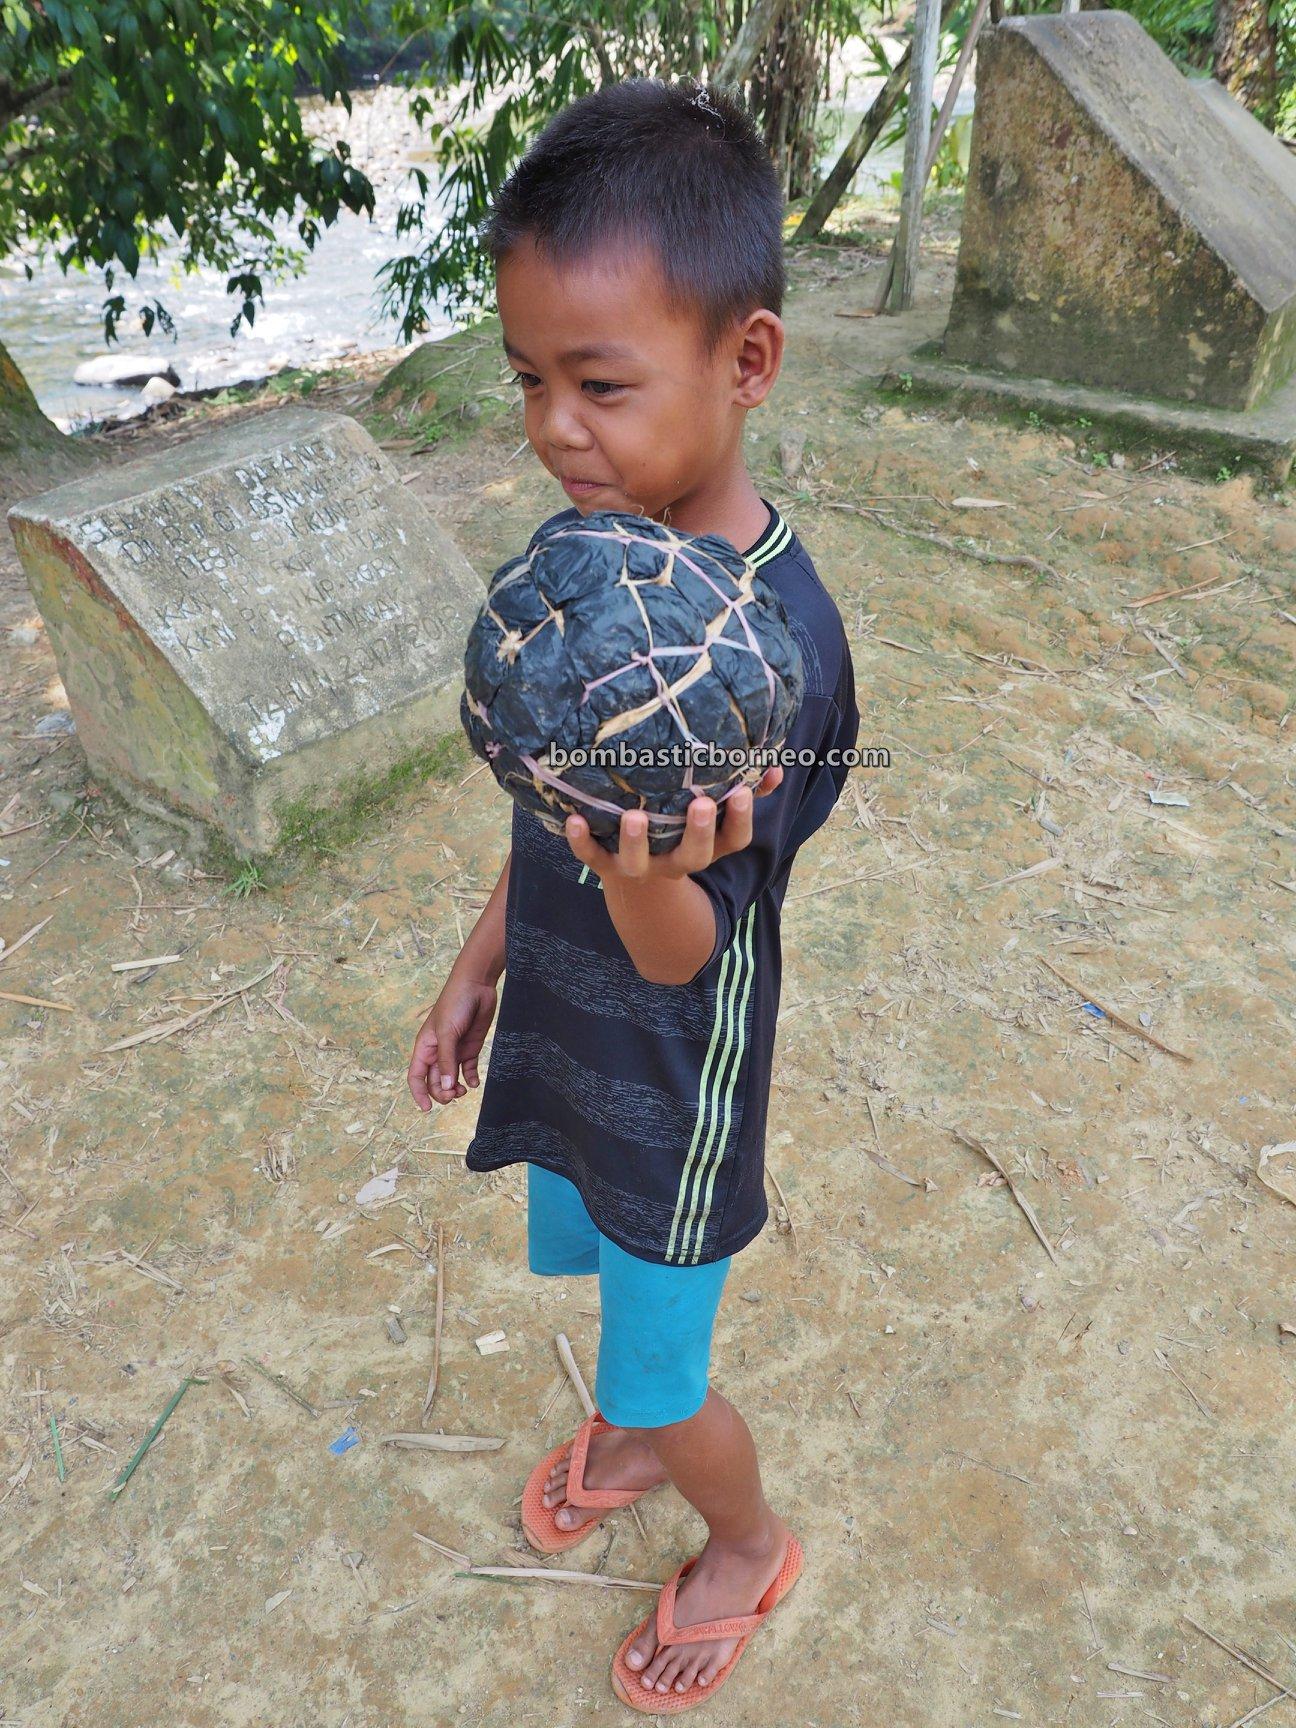 Sungkung Anep, Dusun Medeng, authentic, indigenous, backpackers, destination, Bengkayang, Indonesia, Siding, Ethnic, Dayak Bidayuh, tribe, Tourism, 印尼西加里曼丹, 原住民土著部落,